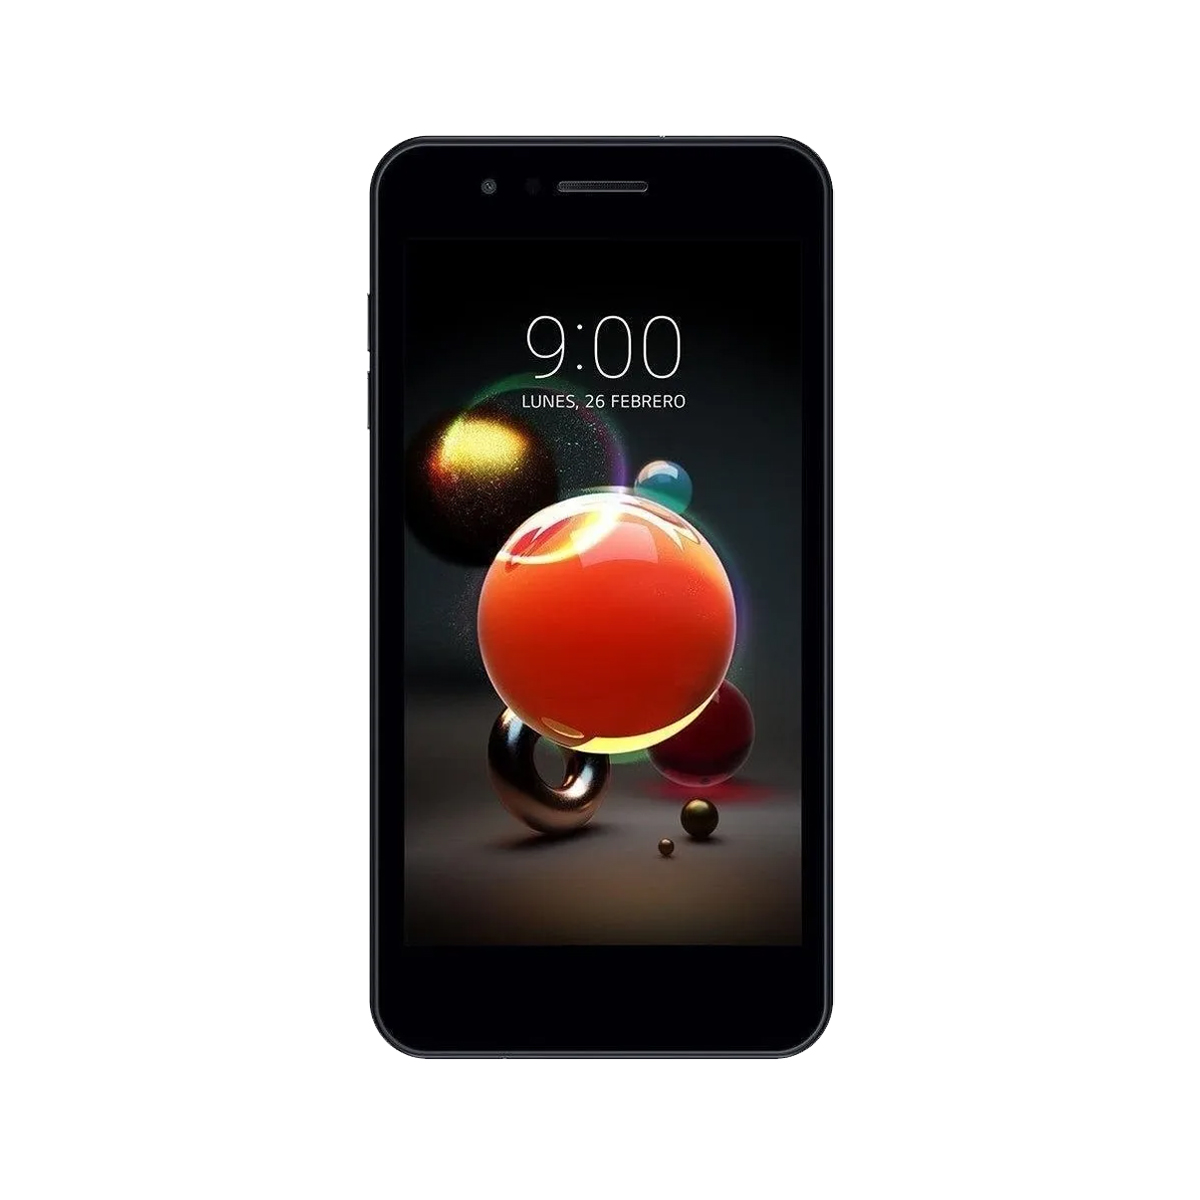 Smartphone Lg K9 TV X210 Tela 5.0' 16GB 4g 8mp - Usado